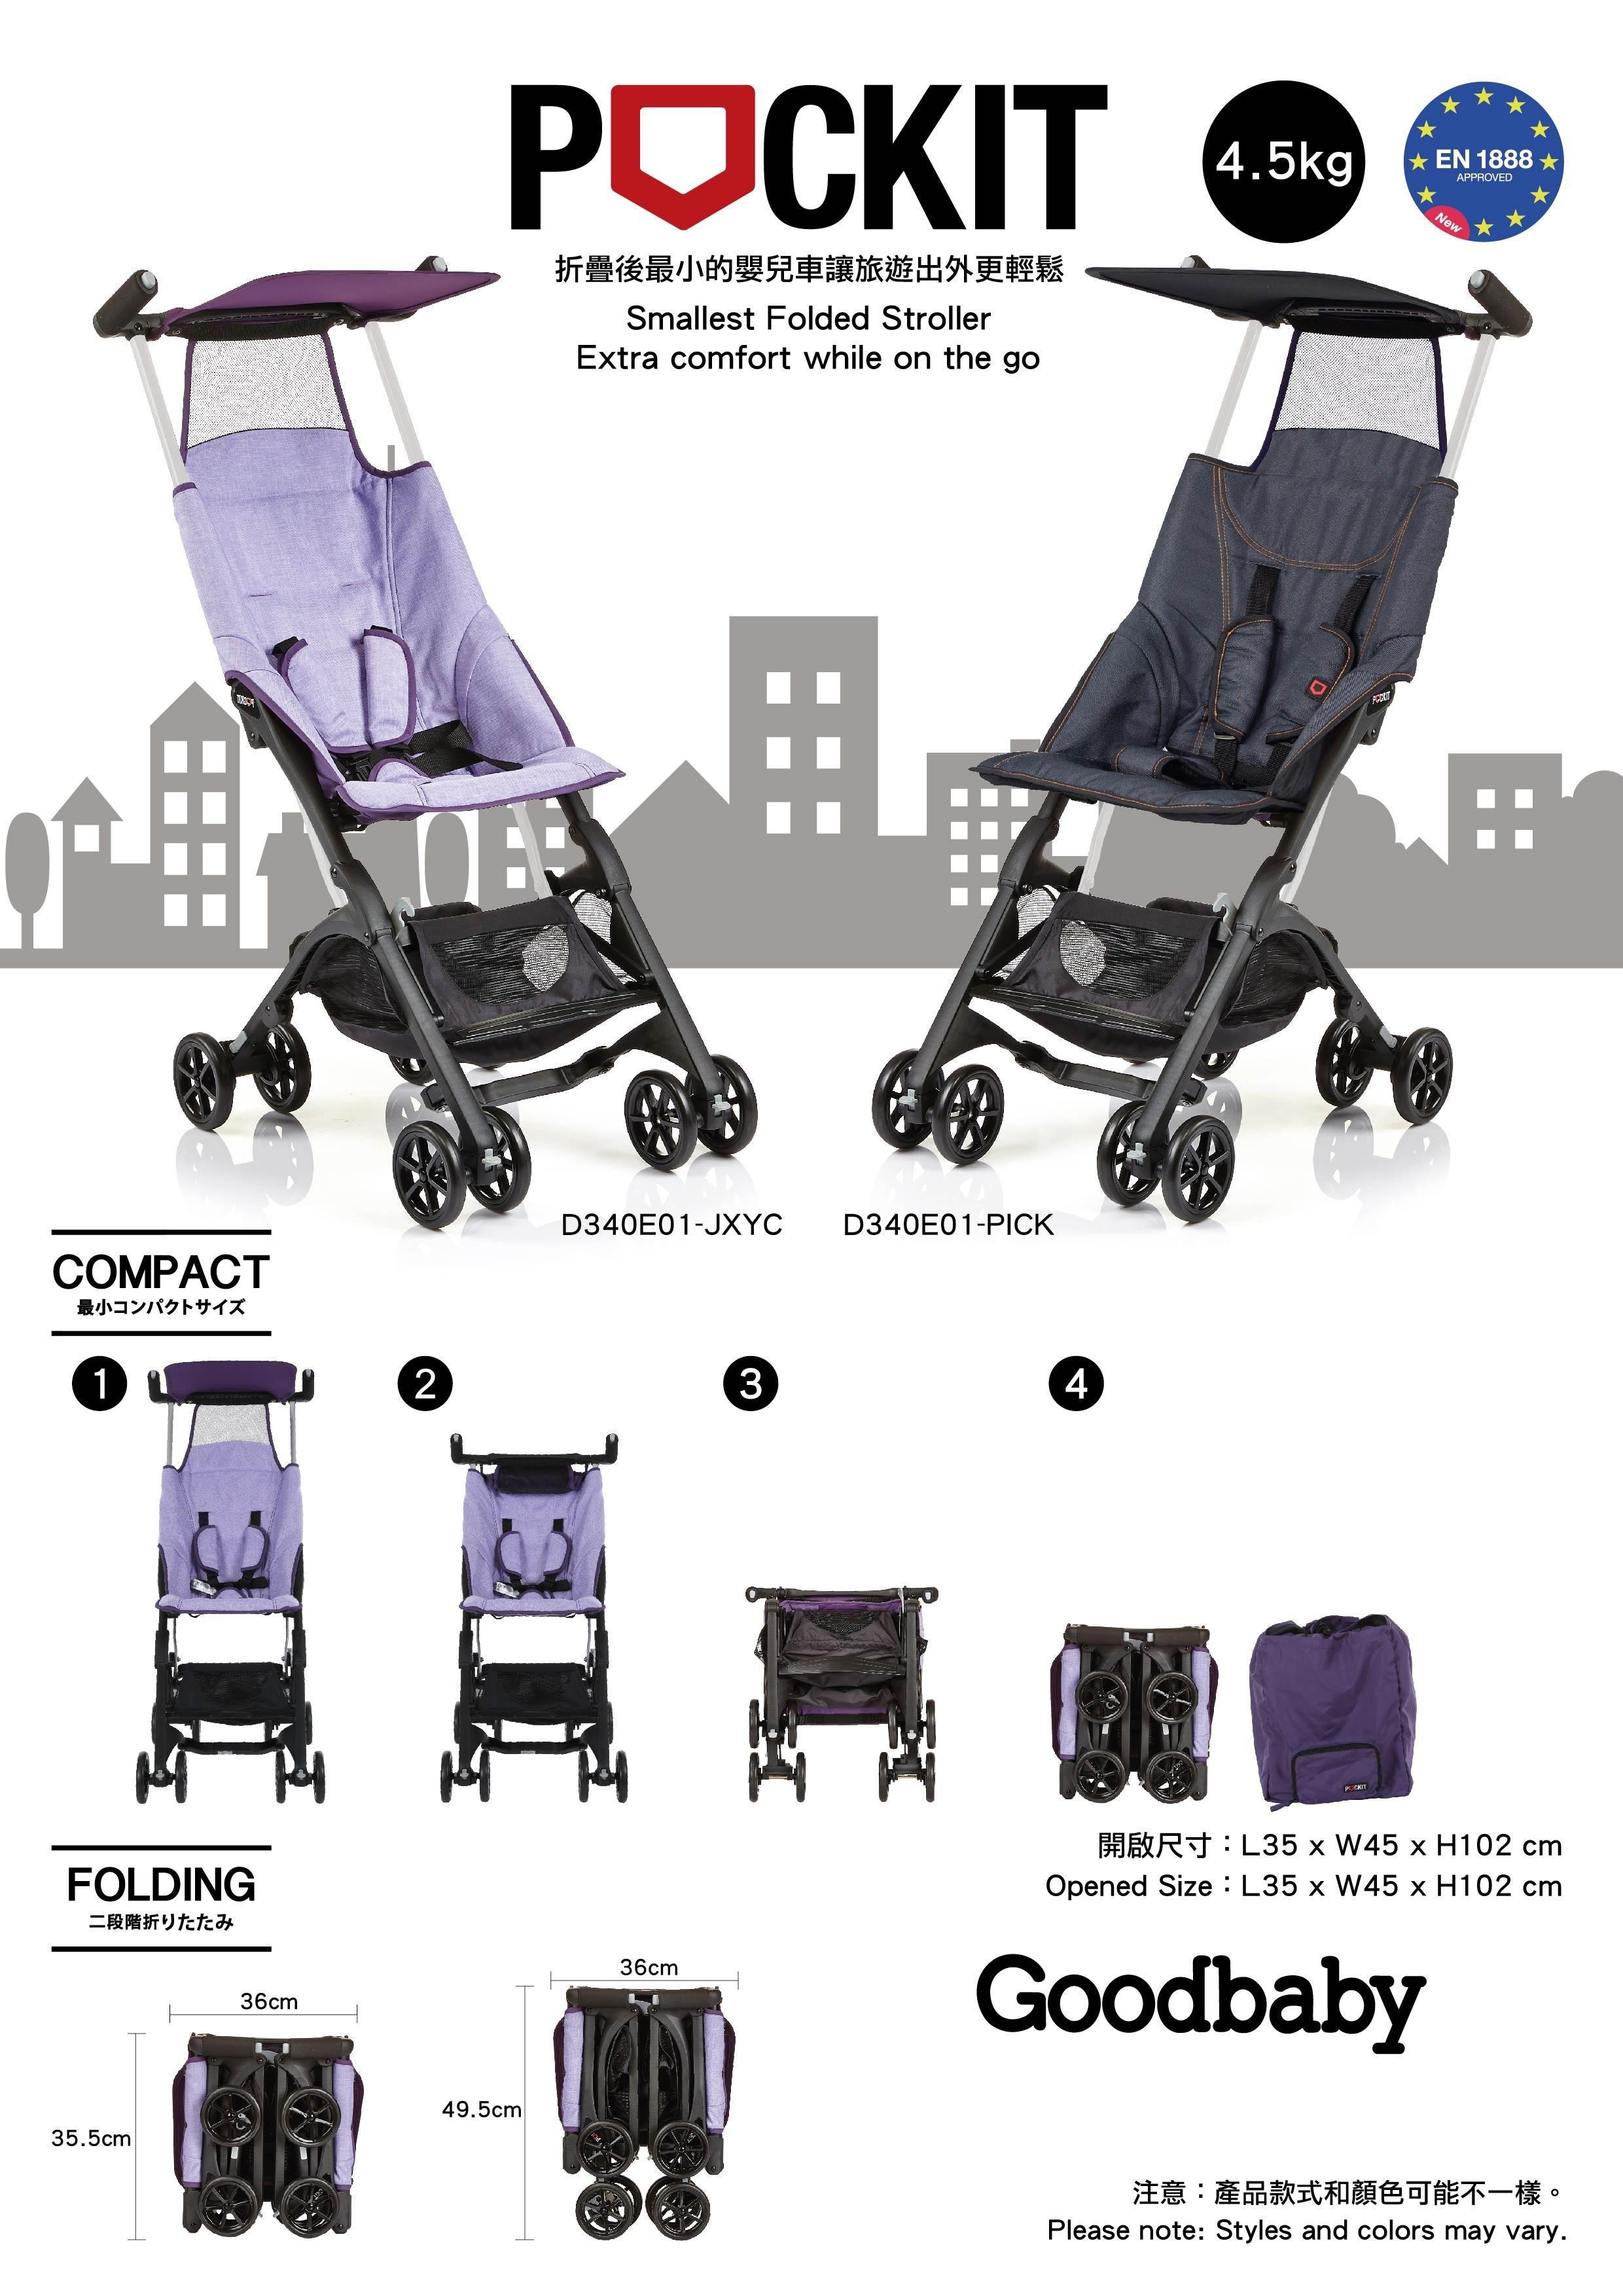 Pockit Stroller The Smallest Folded Stroller Pockit